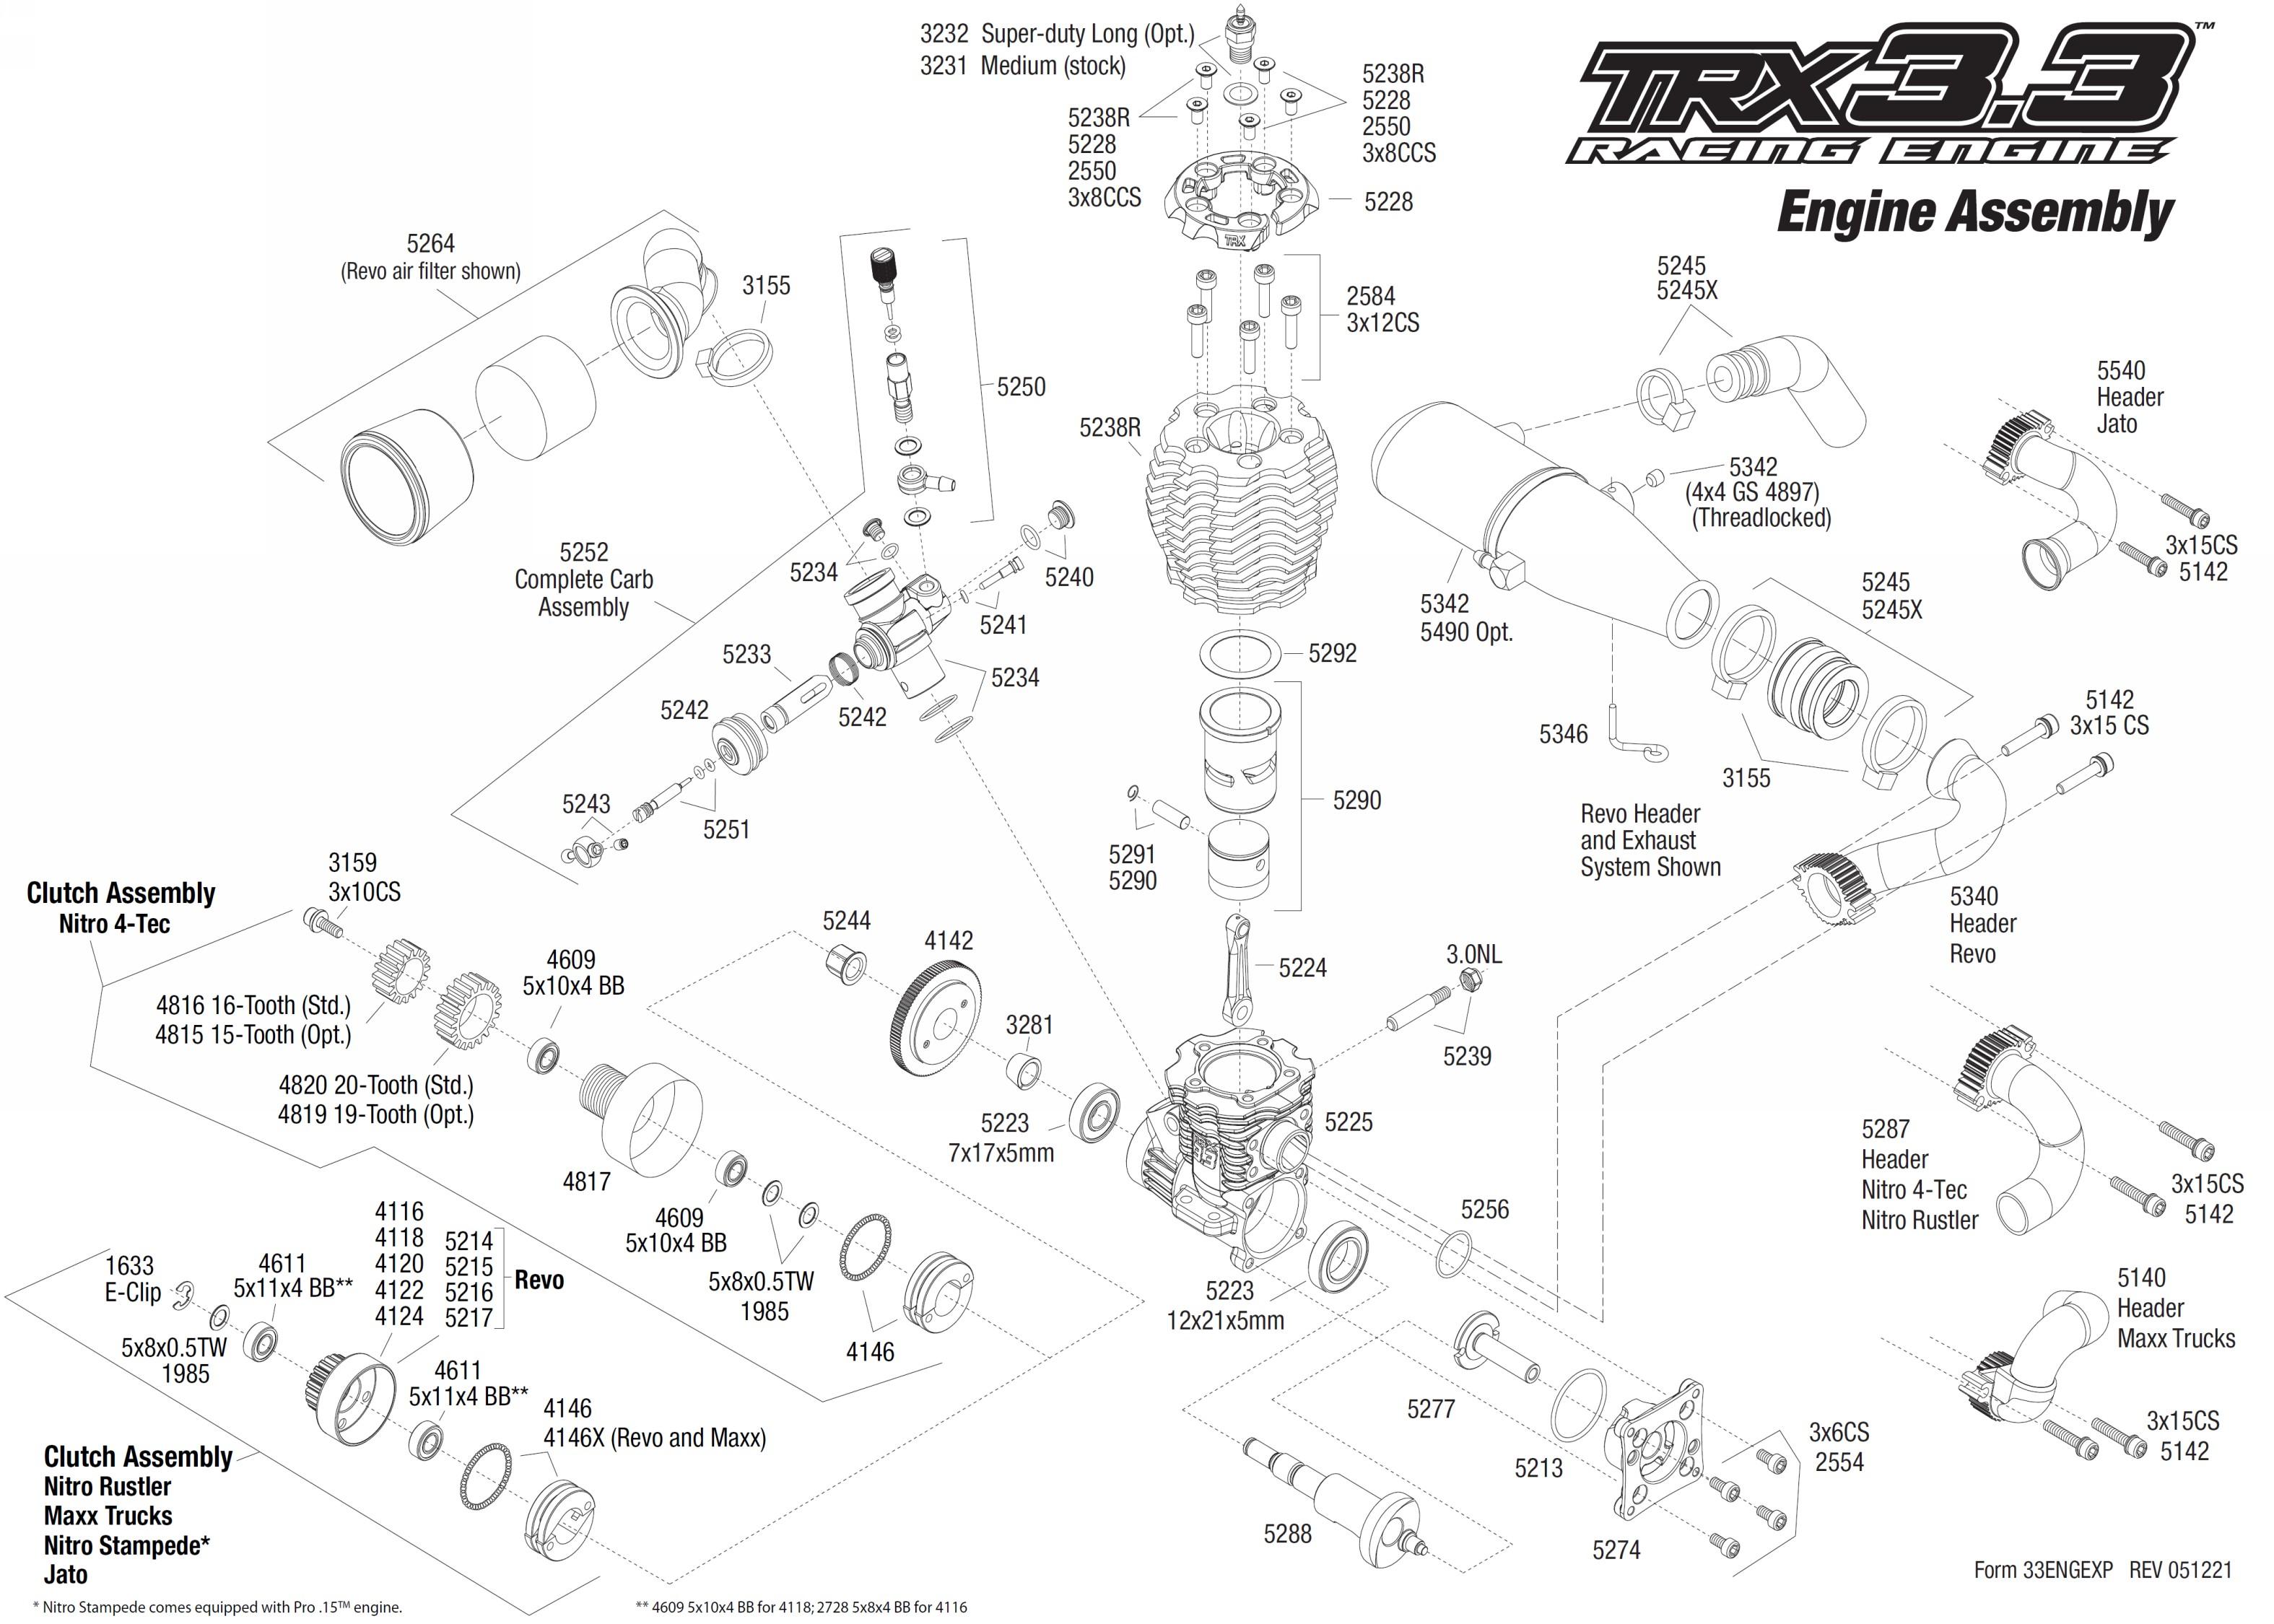 Extraordinary Traxxas Rustler Parts Diagram Ideas - Best Image ...